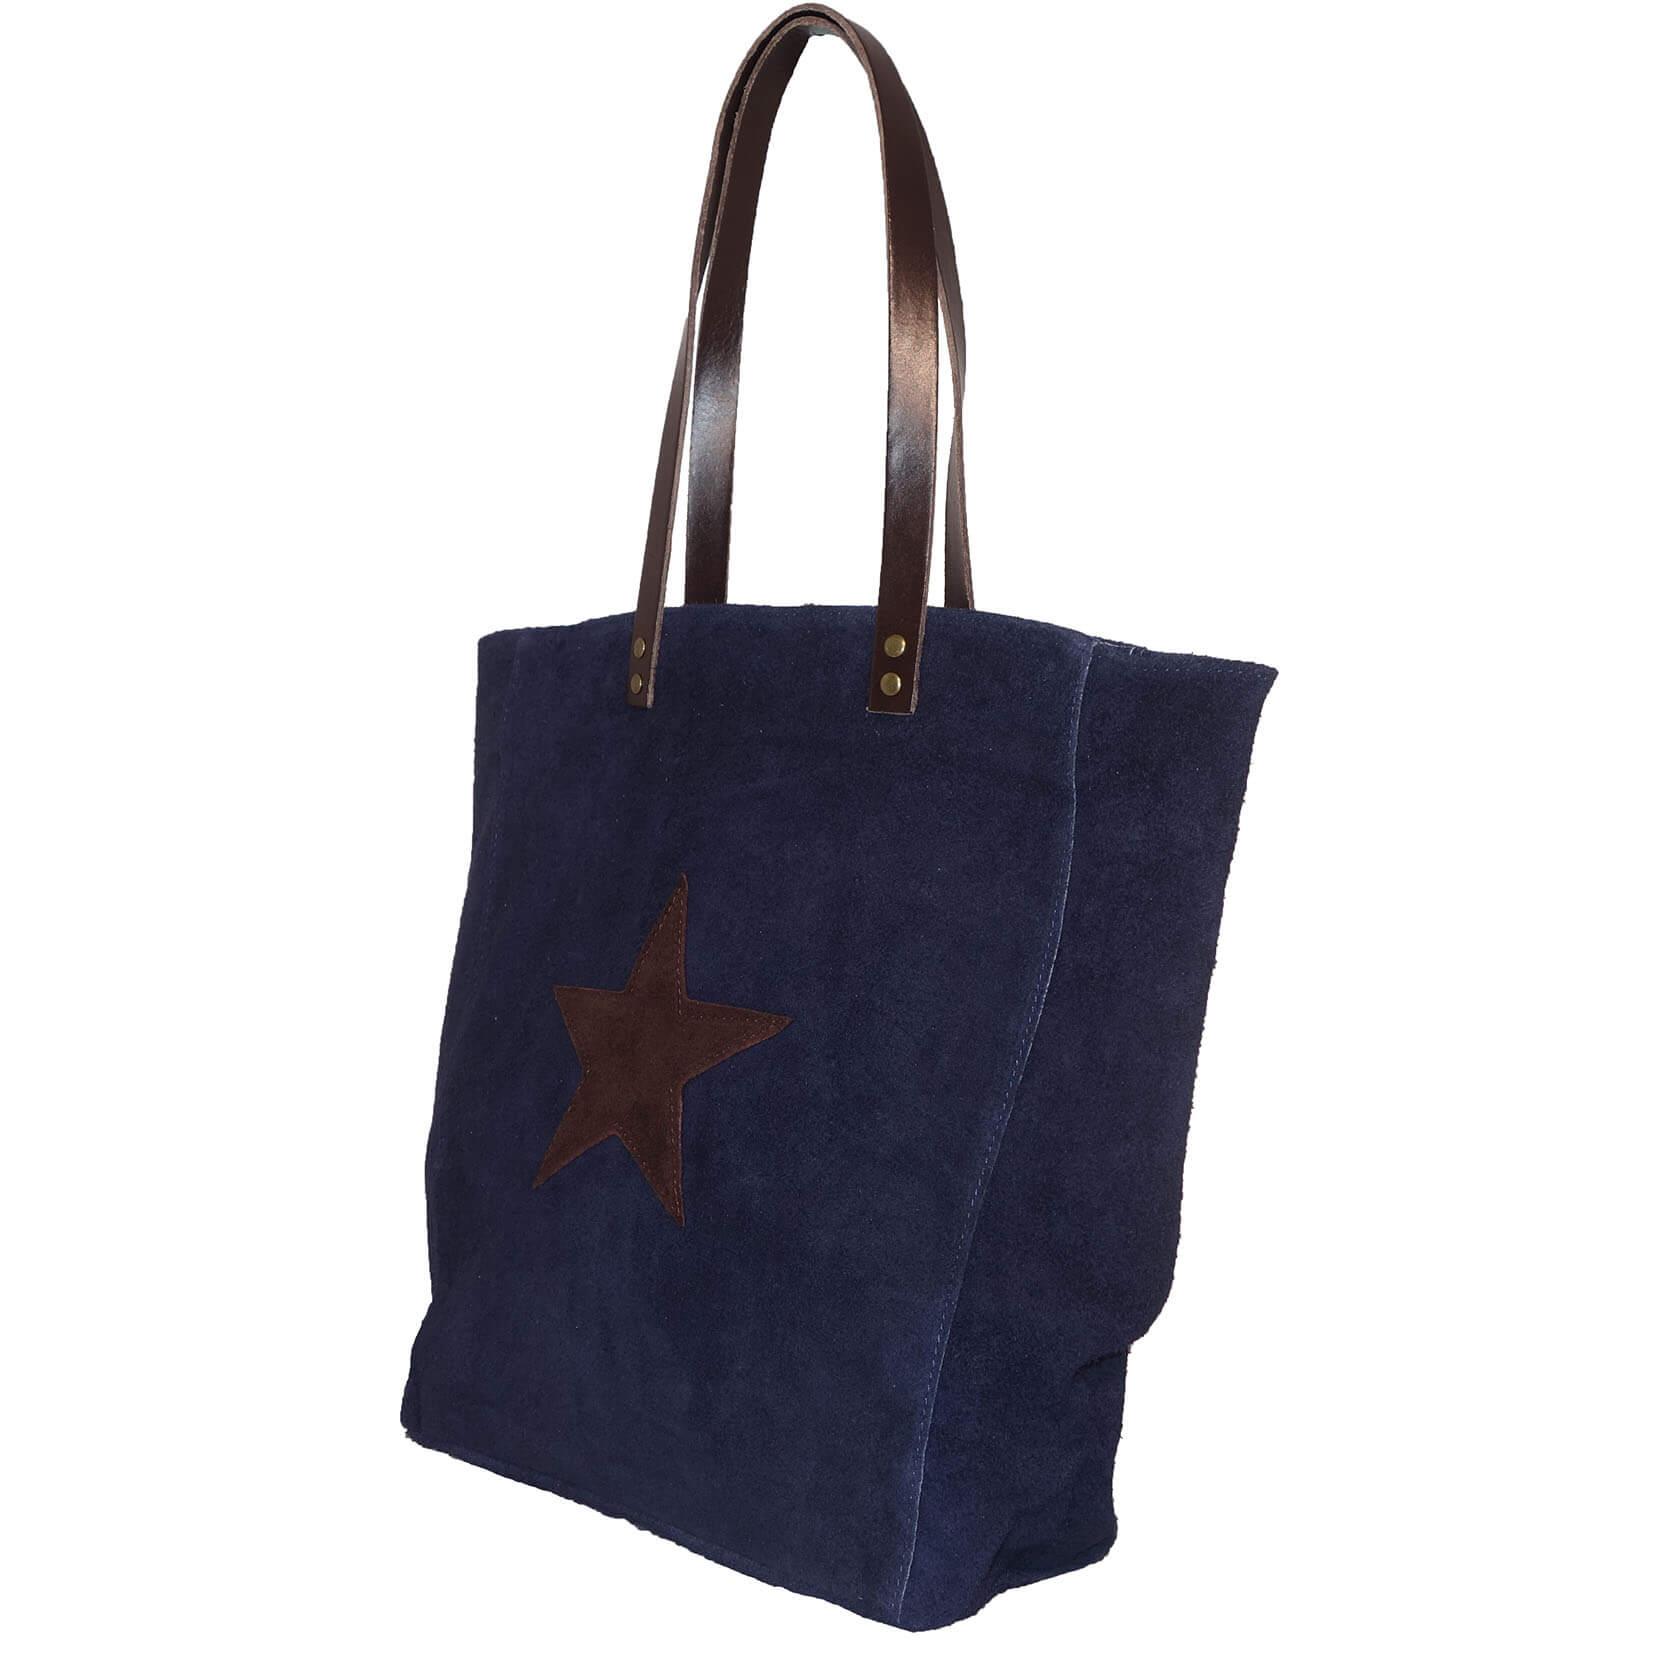 Echt Suède Shopper met Ster Donker Blauw-7707